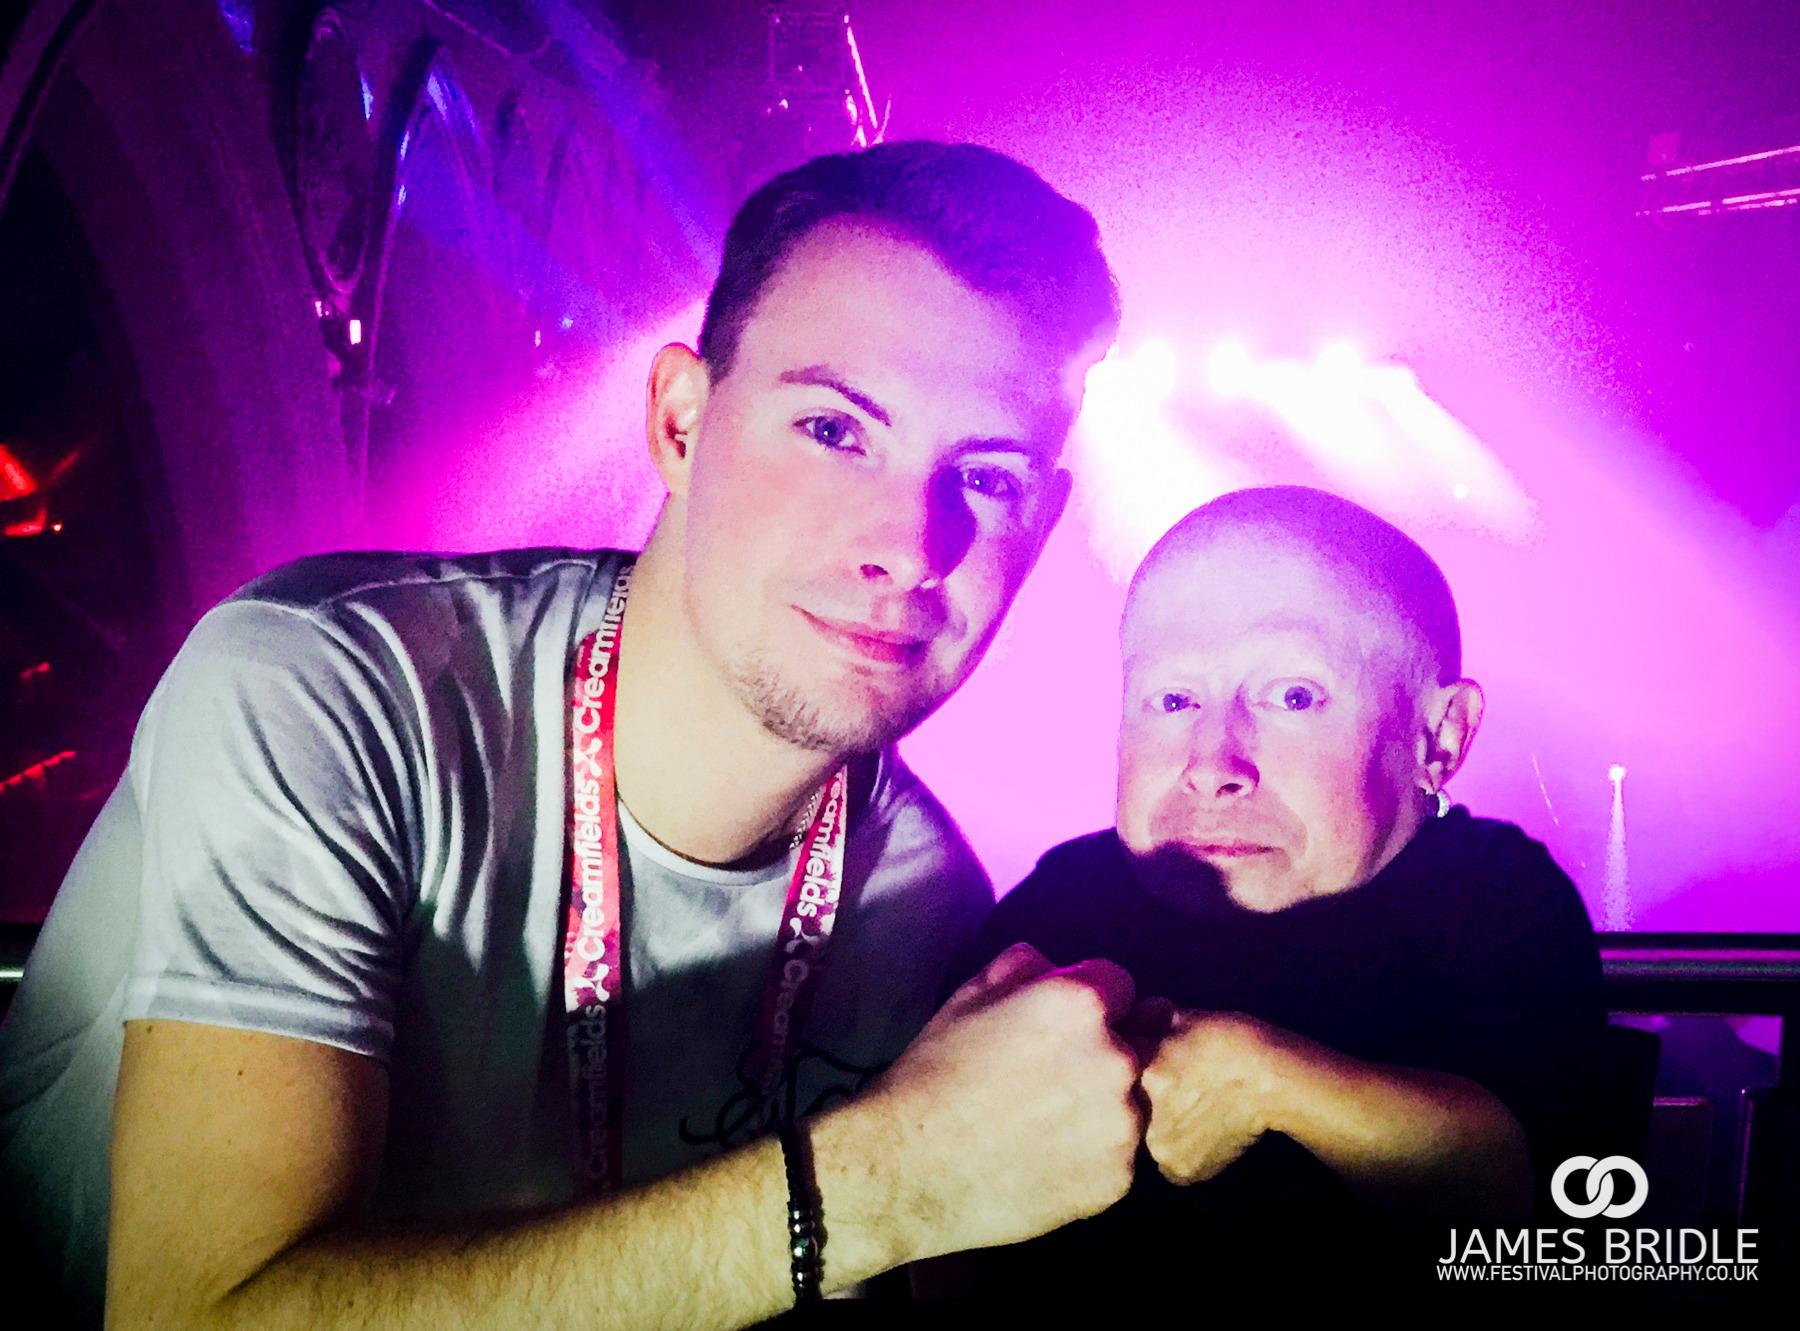 Myself - James Bridle with PA Verne Troya // AKA Mini Me